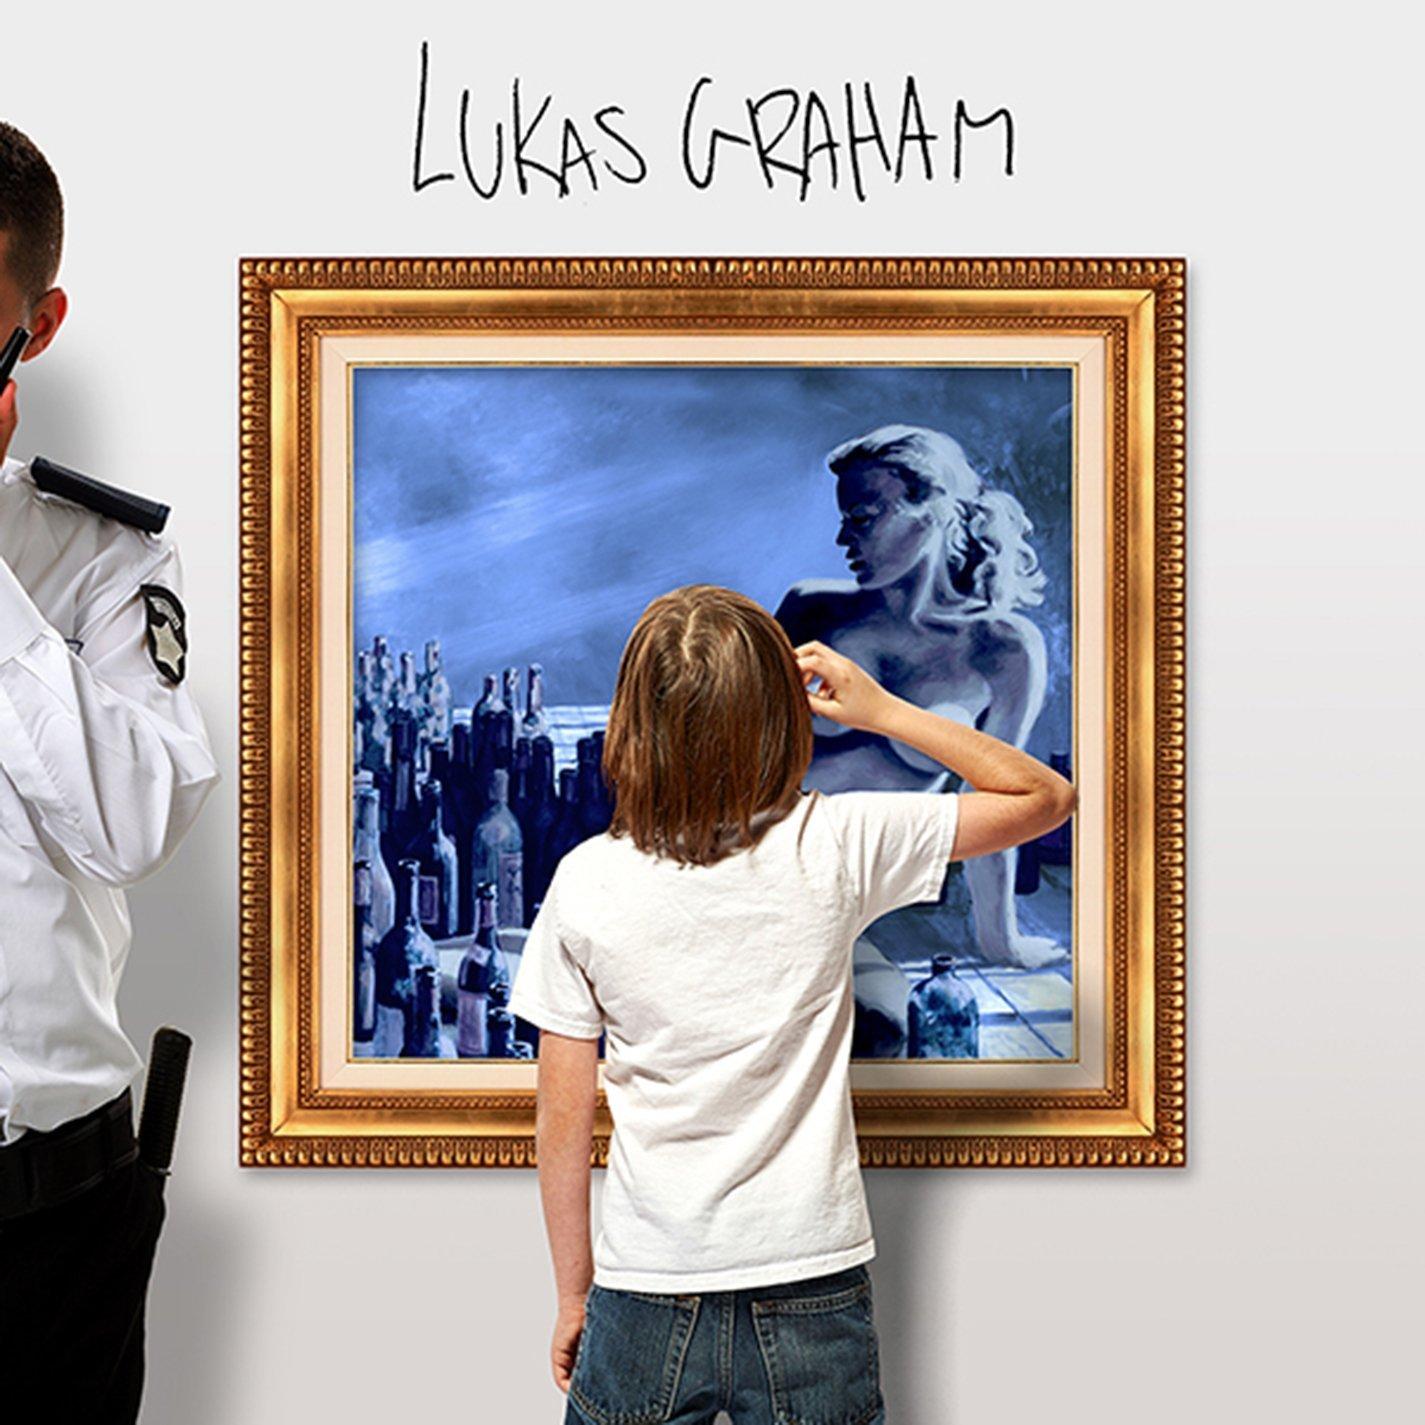 Lukas Graham by Lukas Graham image